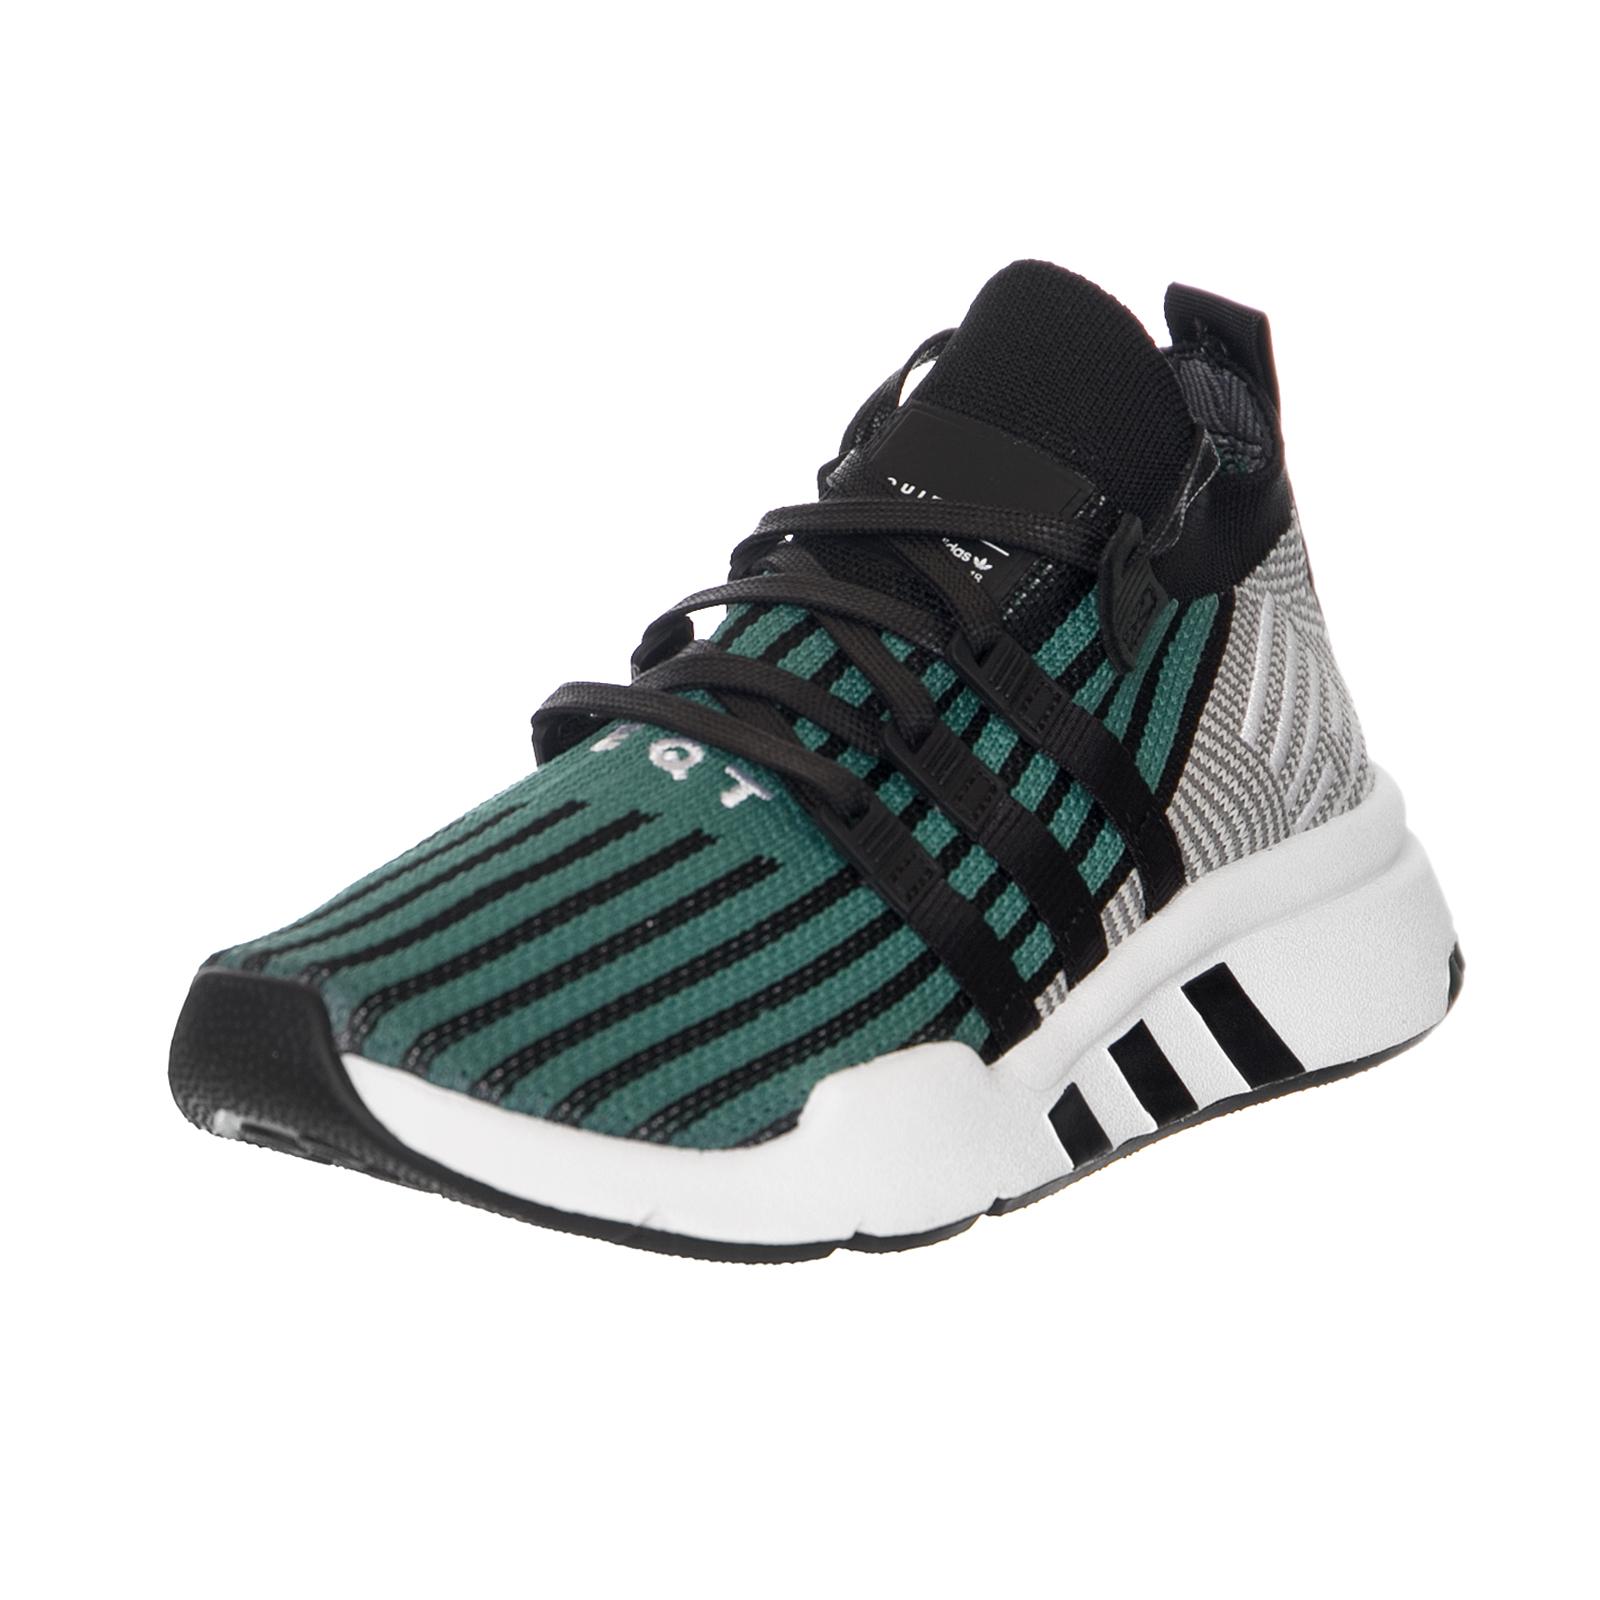 best website 2fdc5 54c74 Adidas Sneakers Eqt Support Mid Adv Black  Black  Green Black